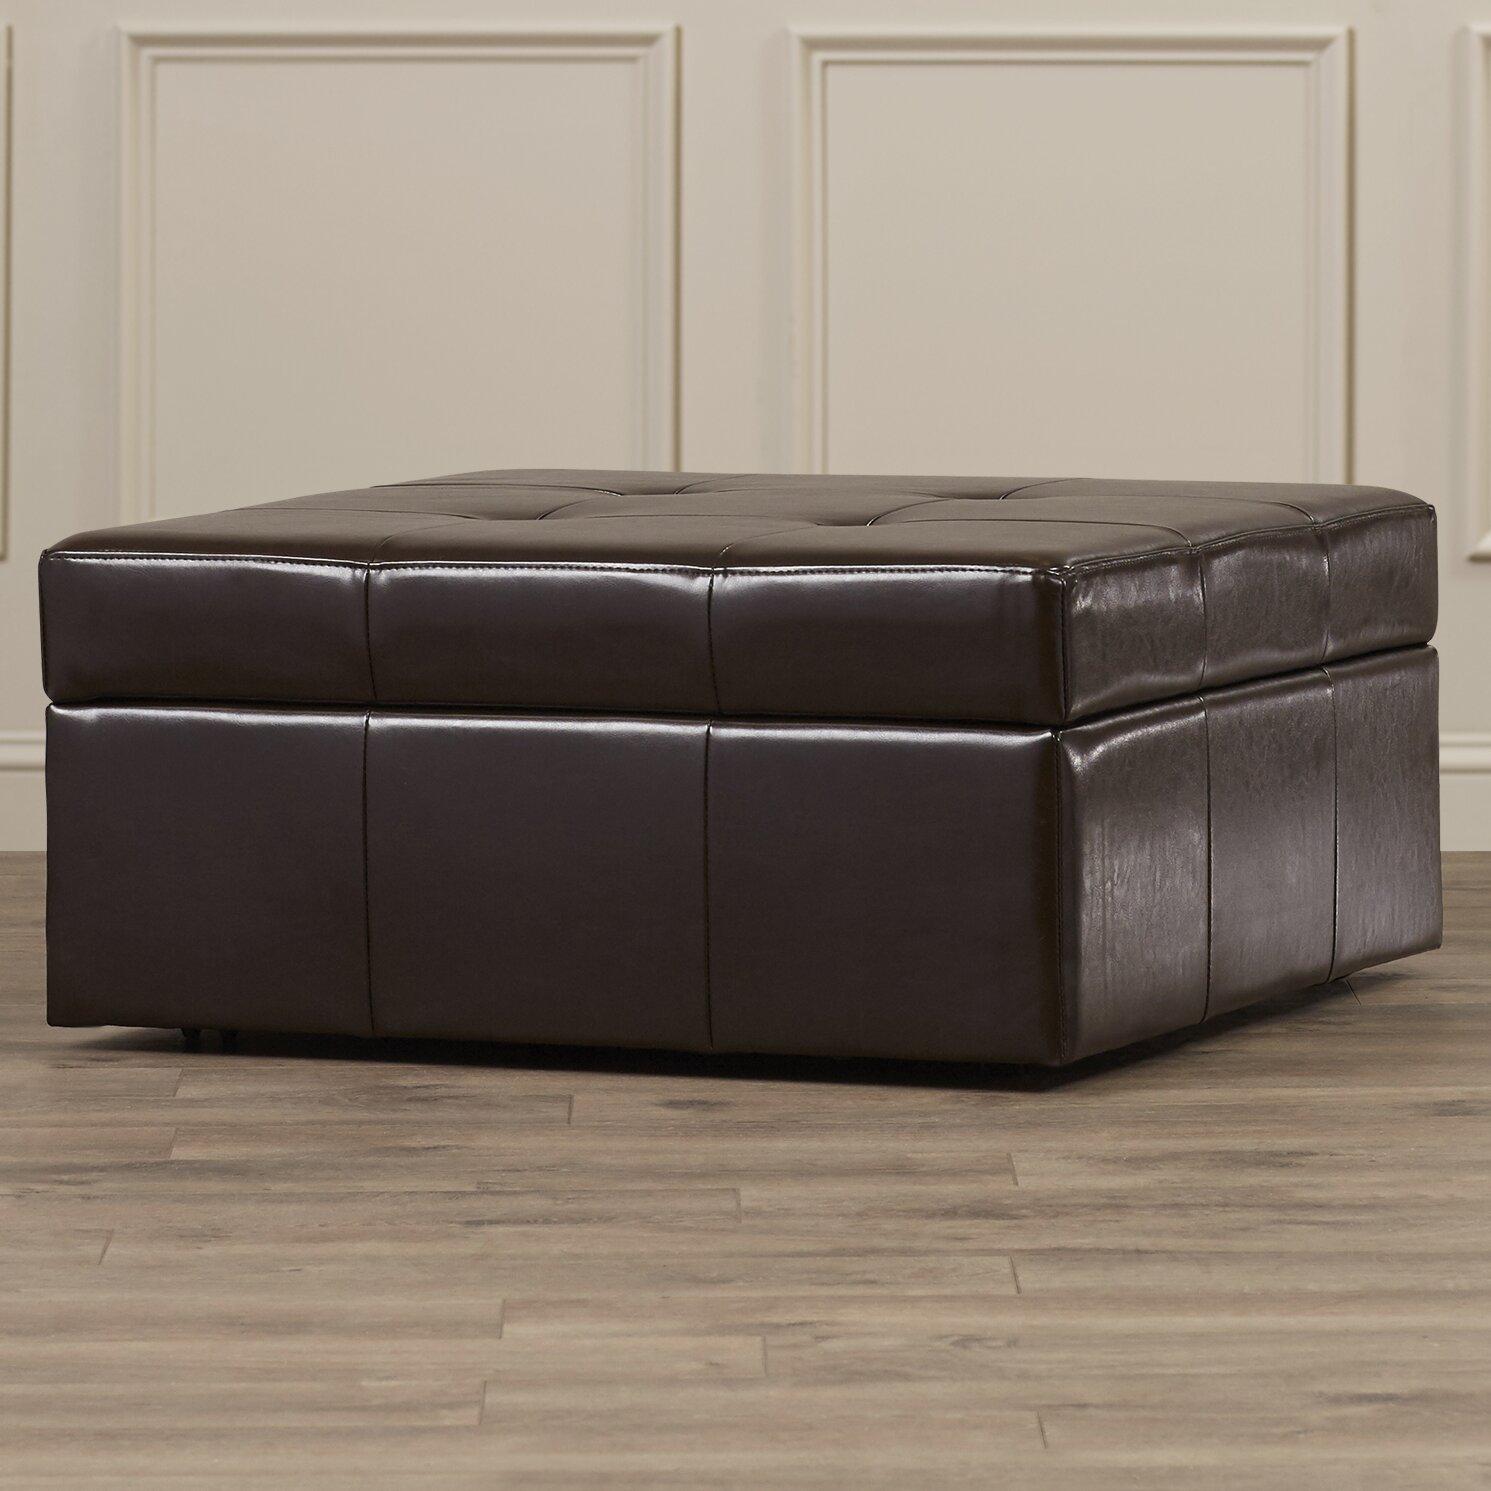 darby home co fryth leather upholstered storage ottoman. Black Bedroom Furniture Sets. Home Design Ideas